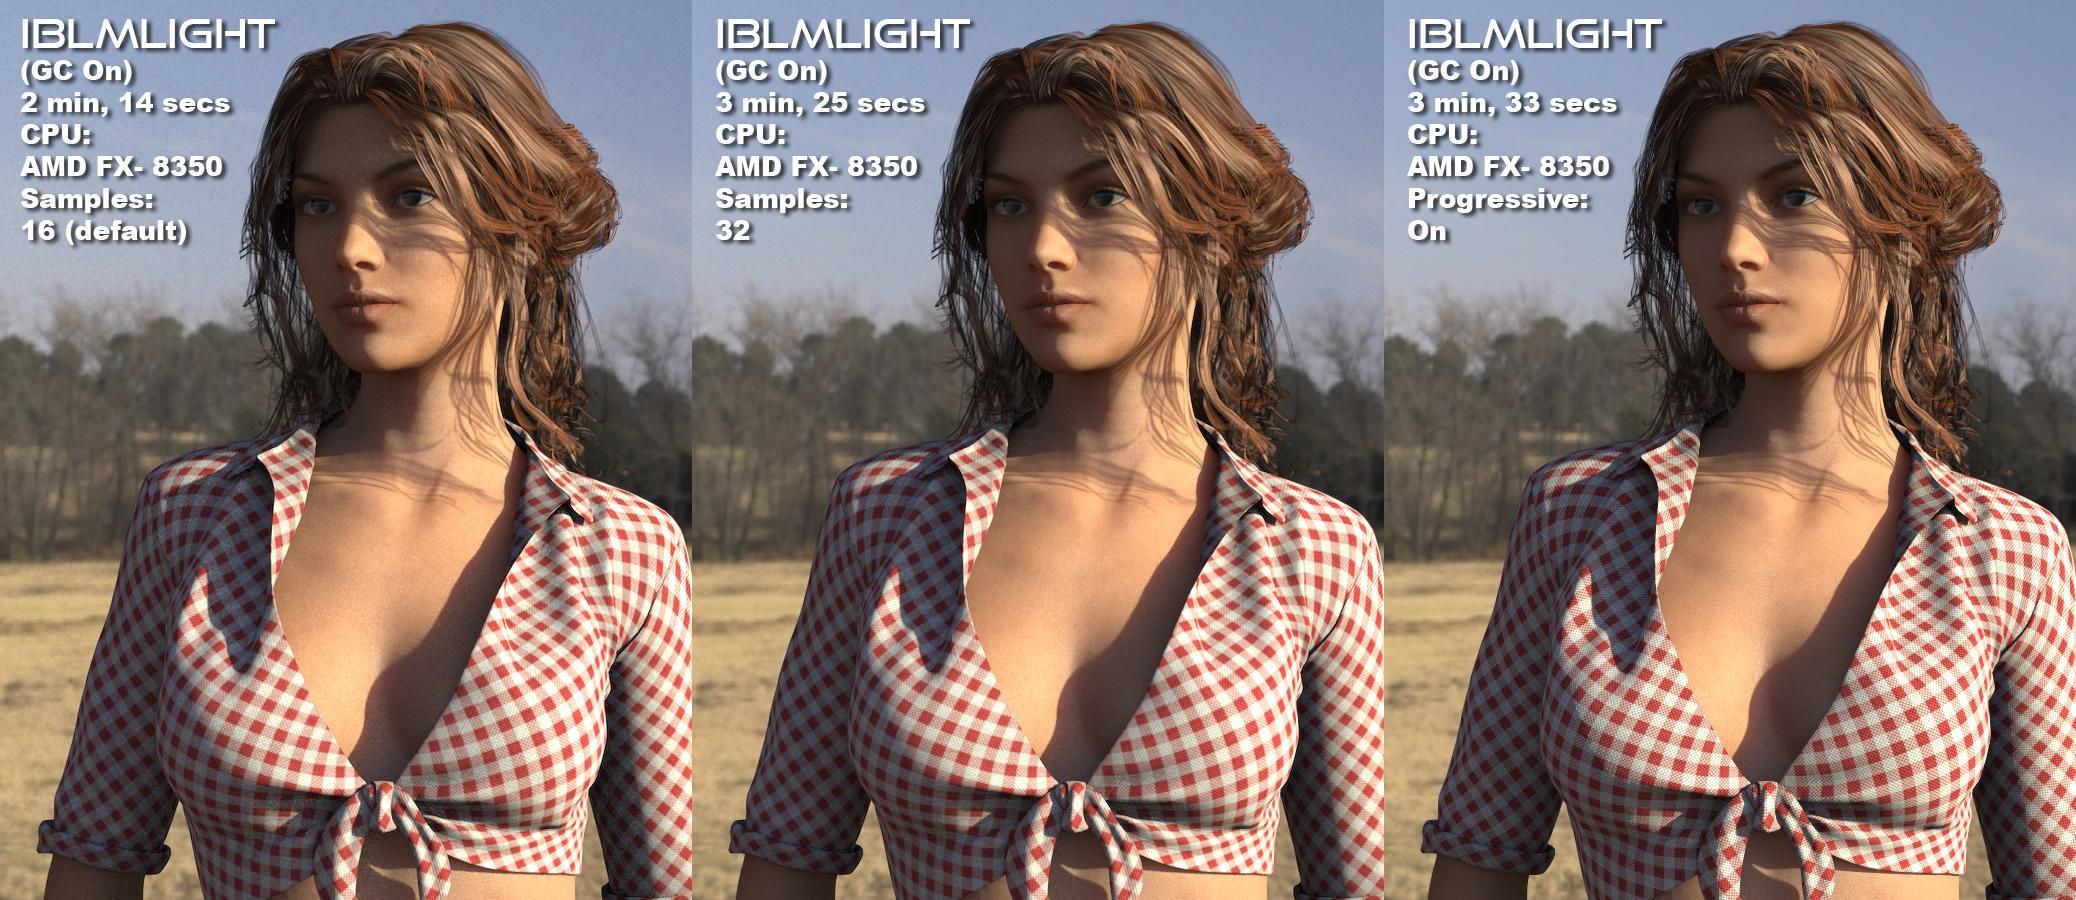 IBLMLight: Default Samples Vs 32 Samples Vs Progressive Rendering On